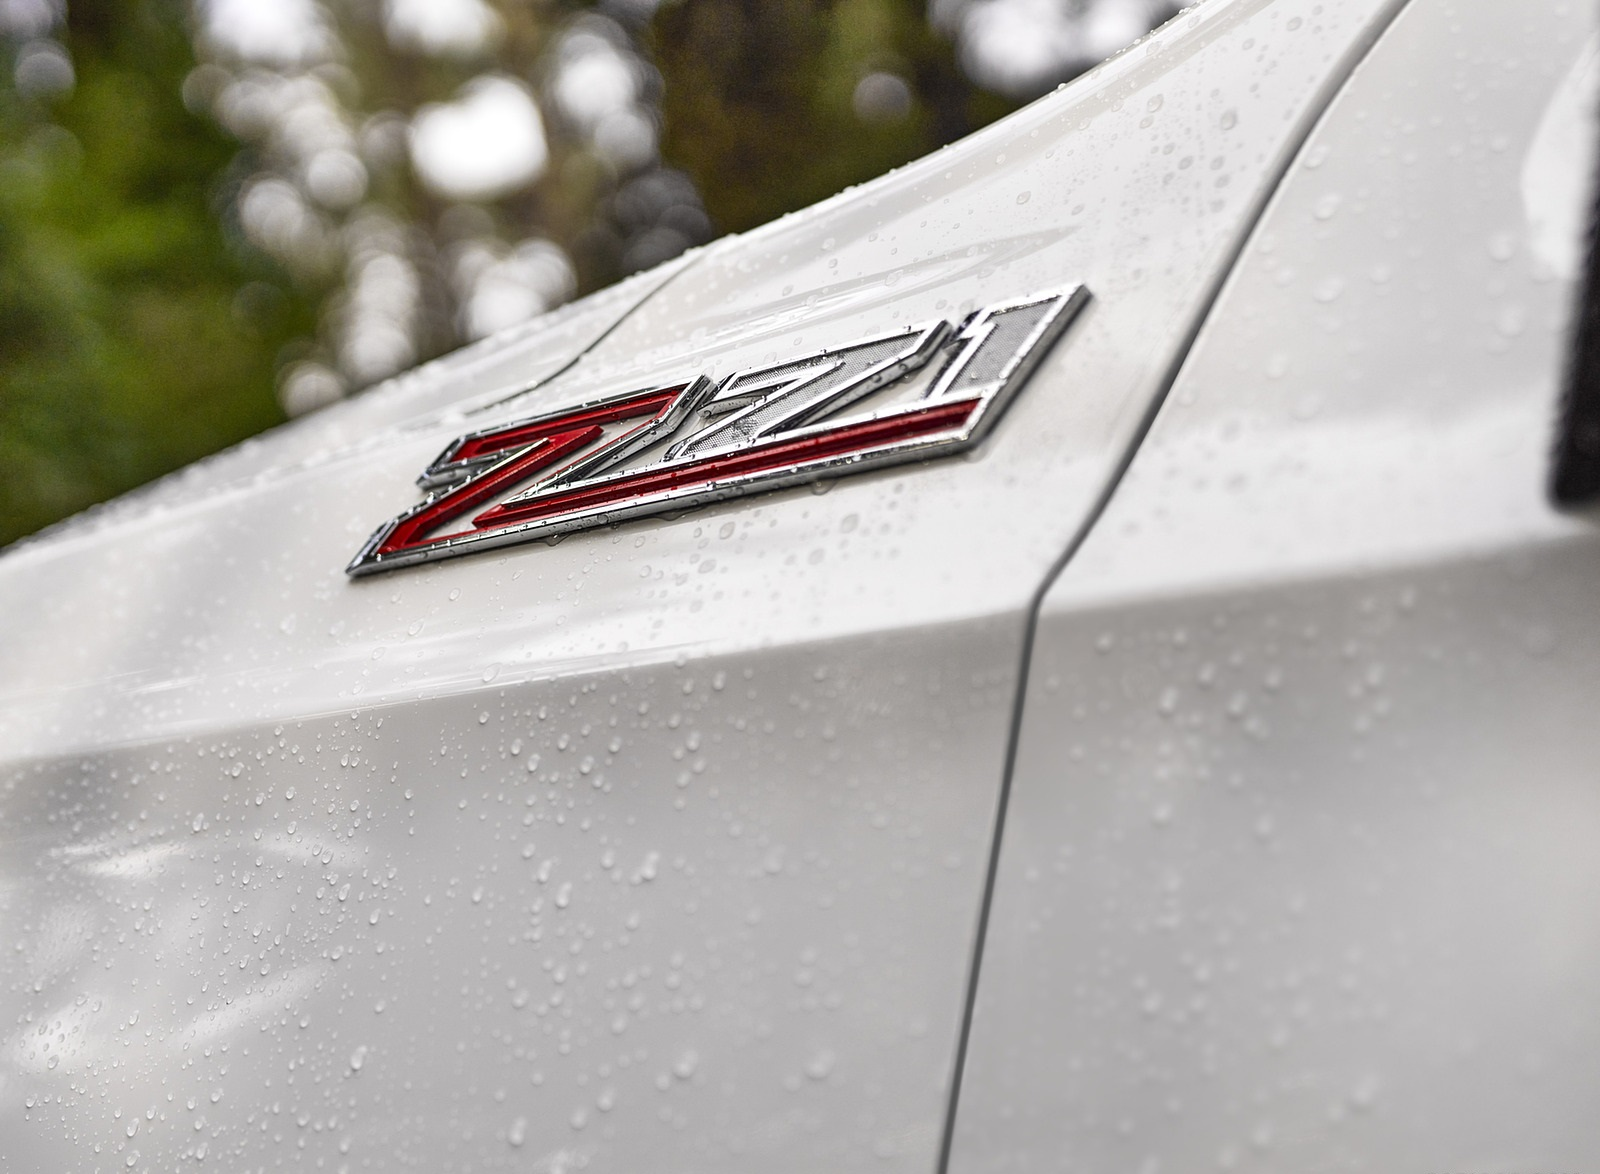 2021 Chevrolet Tahoe Z71 Badge Wallpapers (4)